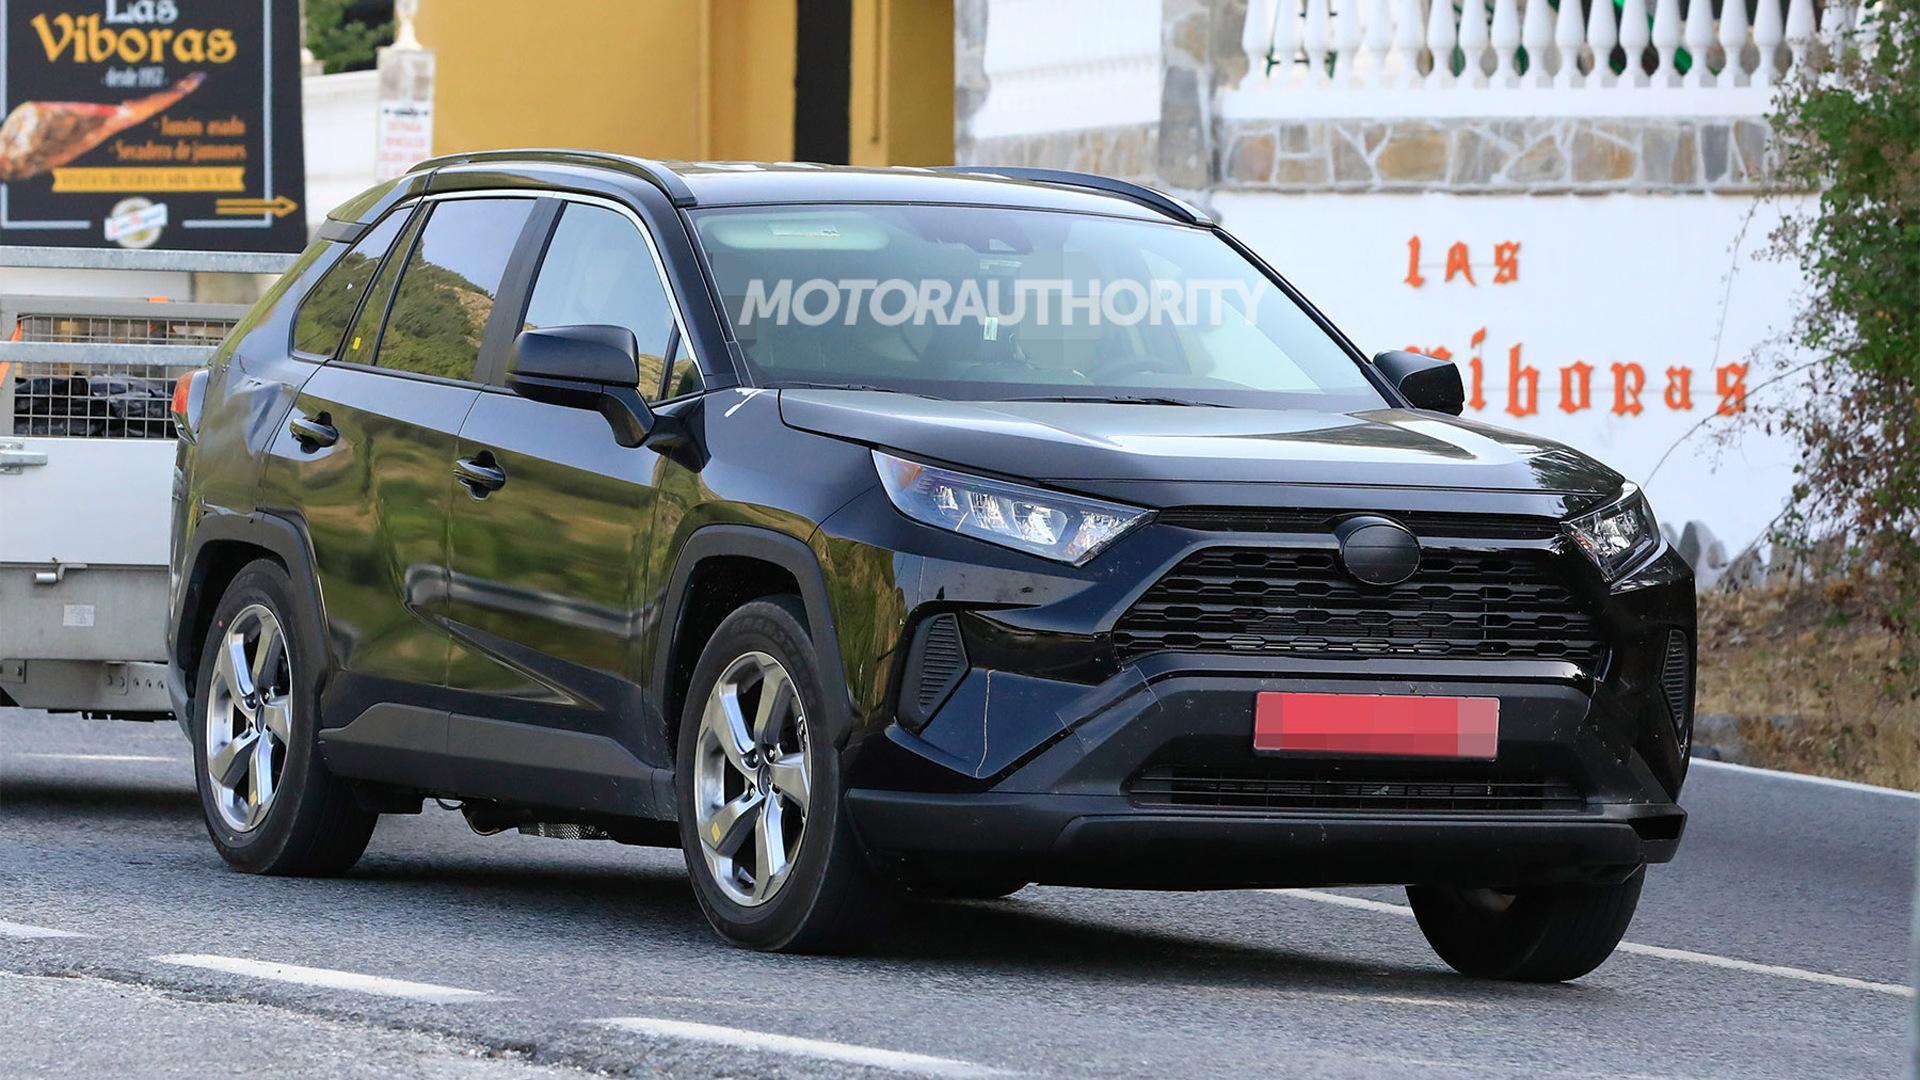 2020 Toyota RAV4: News, Options, Design, Release >> 2020 Toyota Rav4 Plug In Hybrid Spy Shots